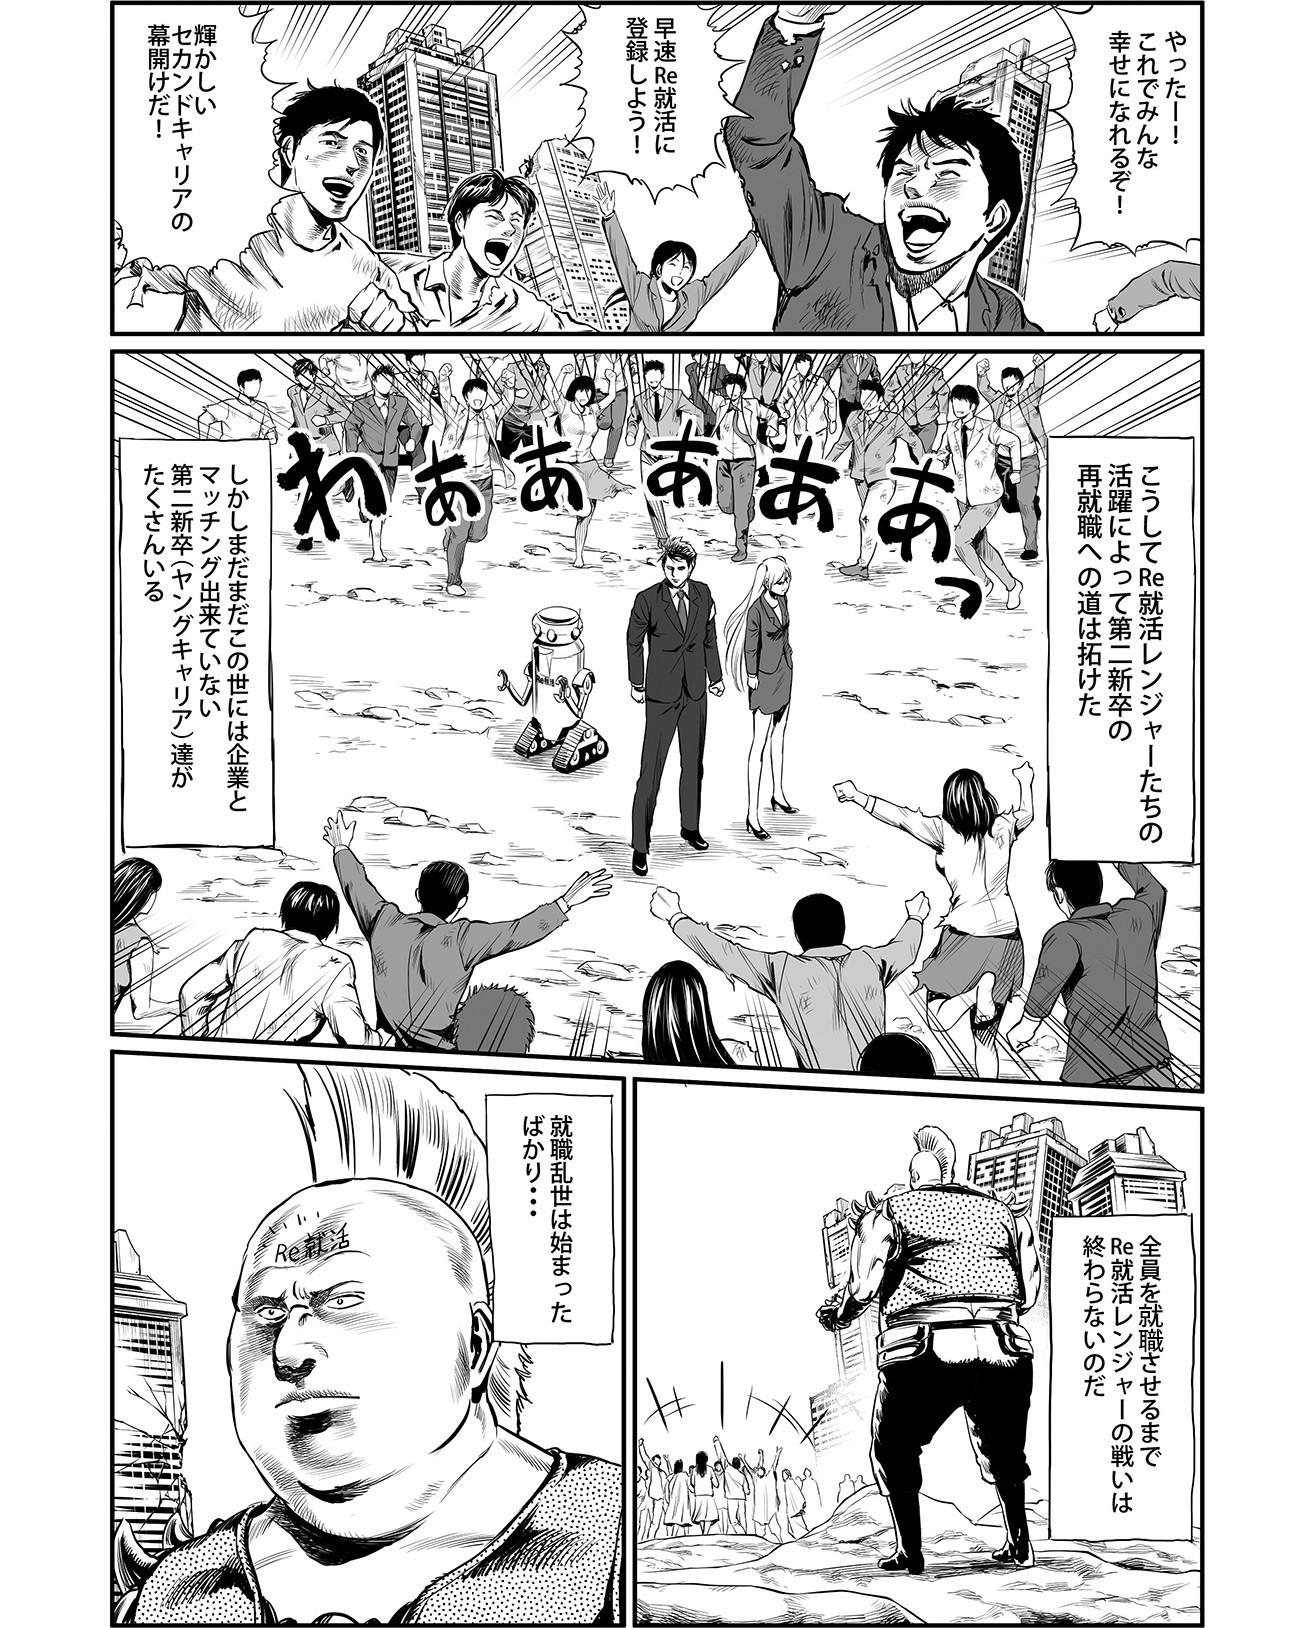 gakujo12_1310